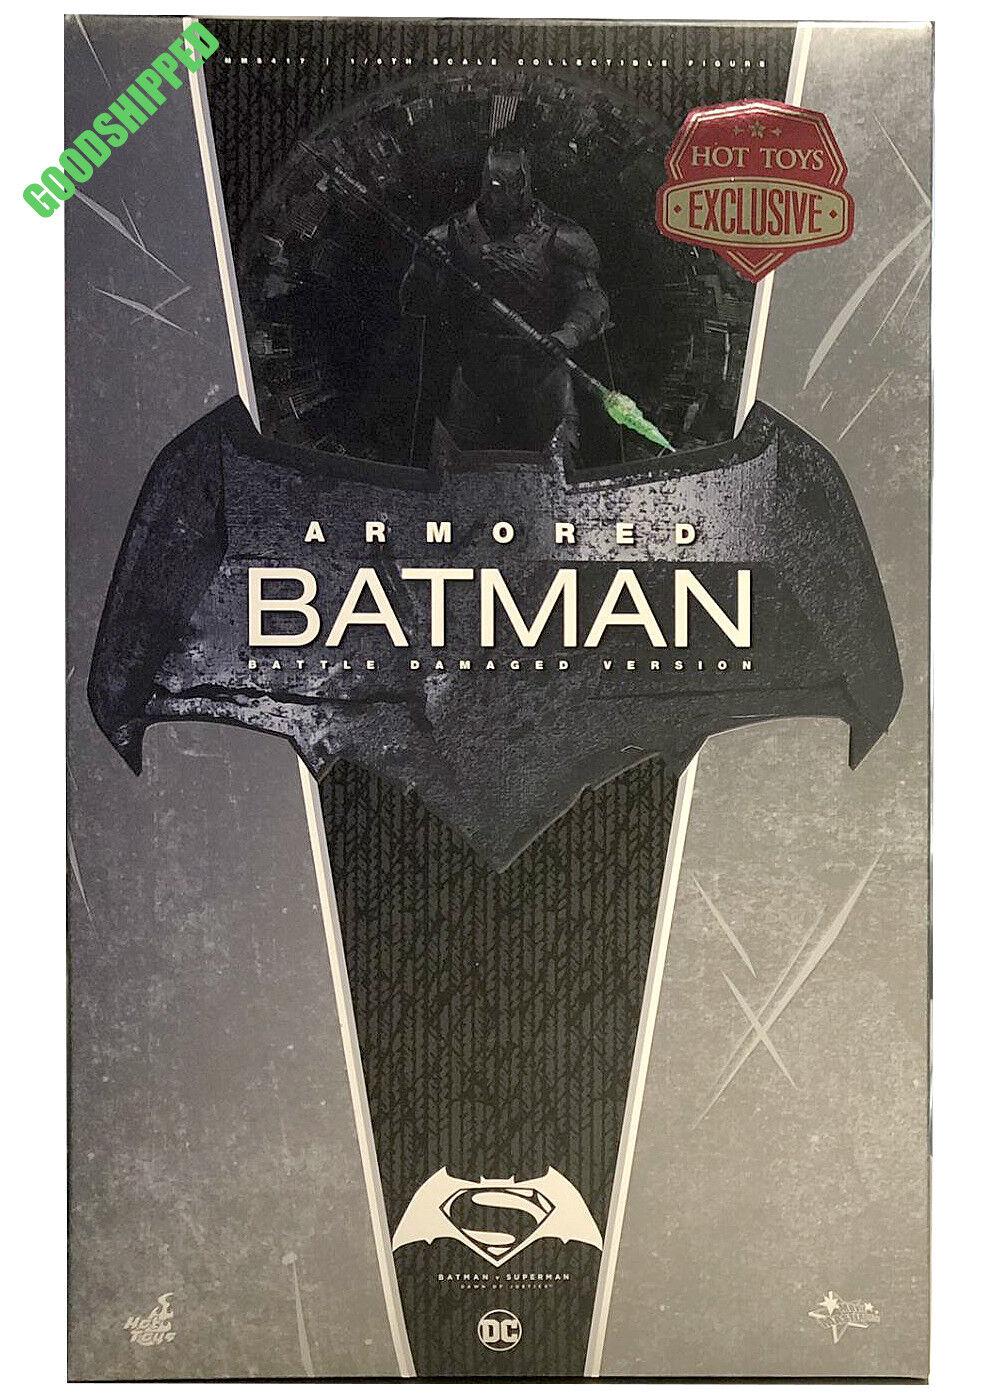 READY HOT TOYS BATMAN V SUPERMAN BVS ARMORED BATMAN BATTLE DAMAGED EXCLUSIVE 1 6